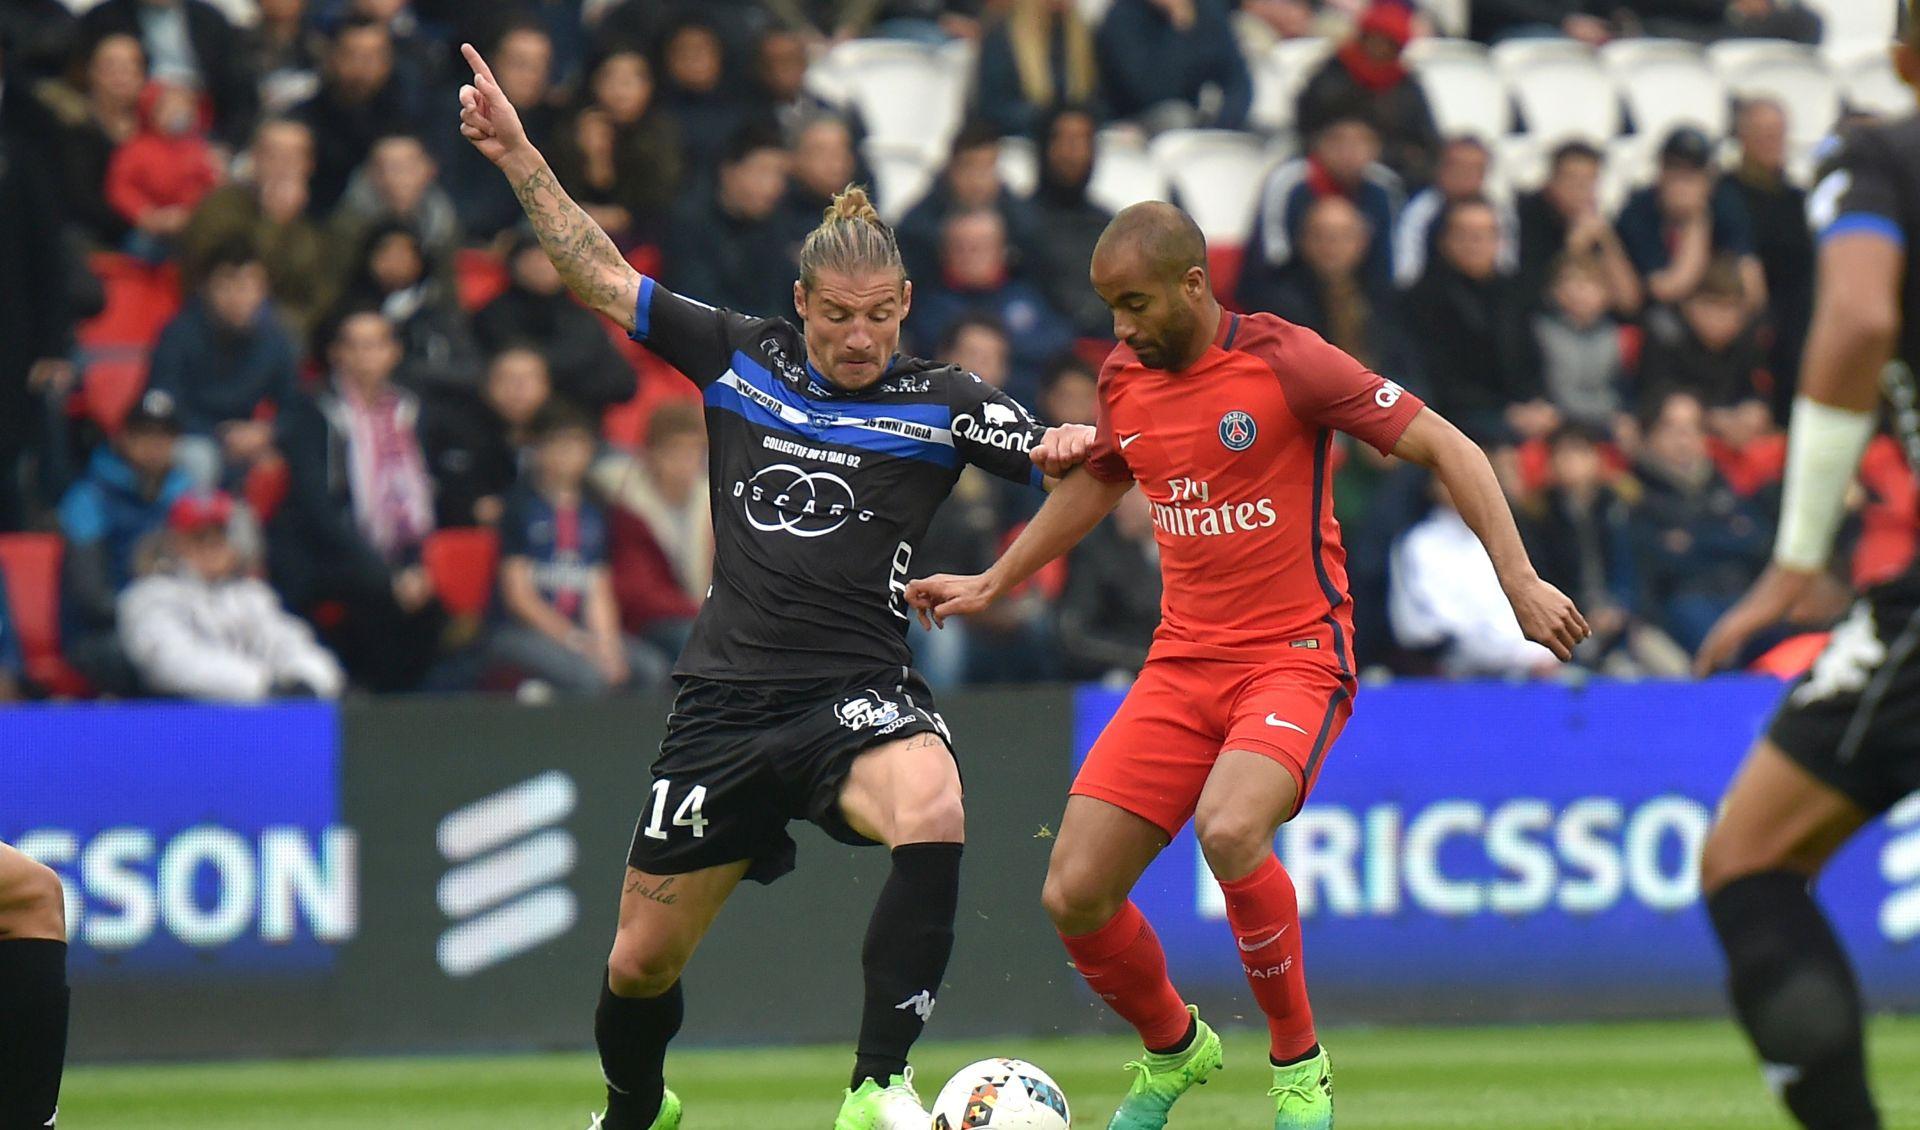 FRANCUSKA Monaco tri boda od naslova, Santini spašava Caen